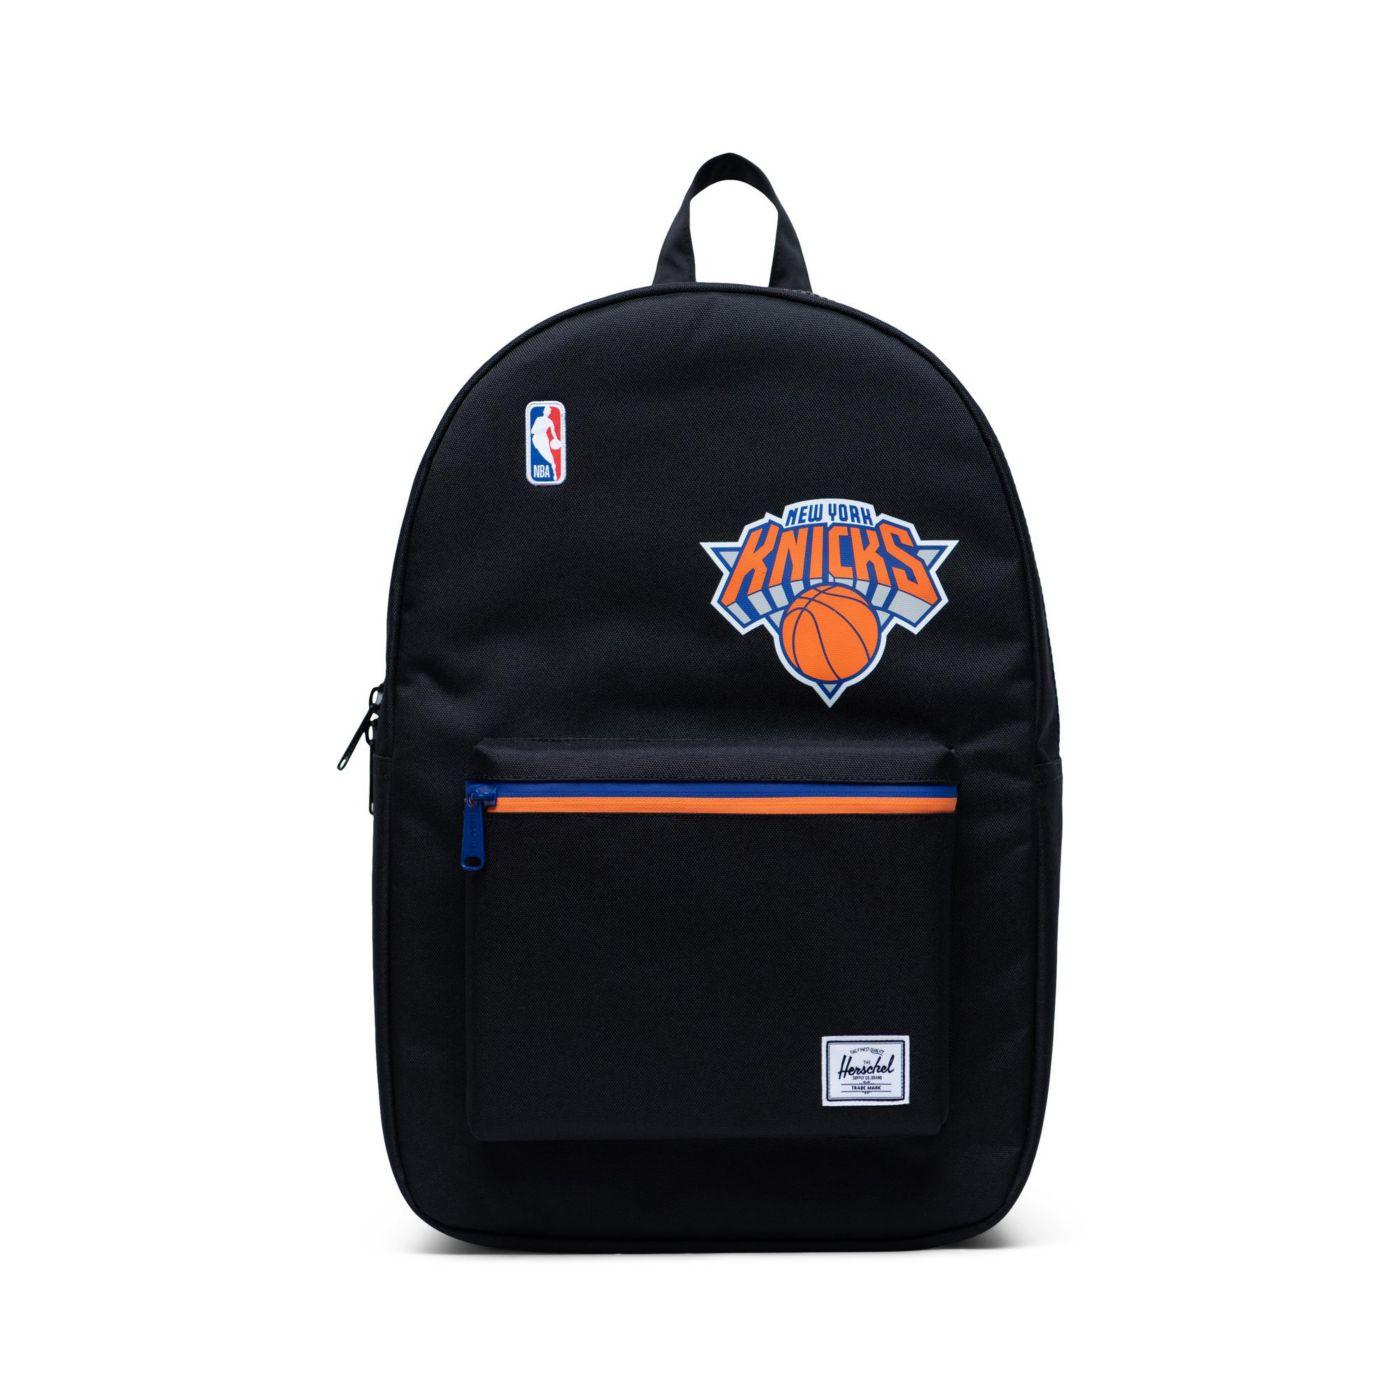 Herschel New York Knicks Black Settlement Backpack